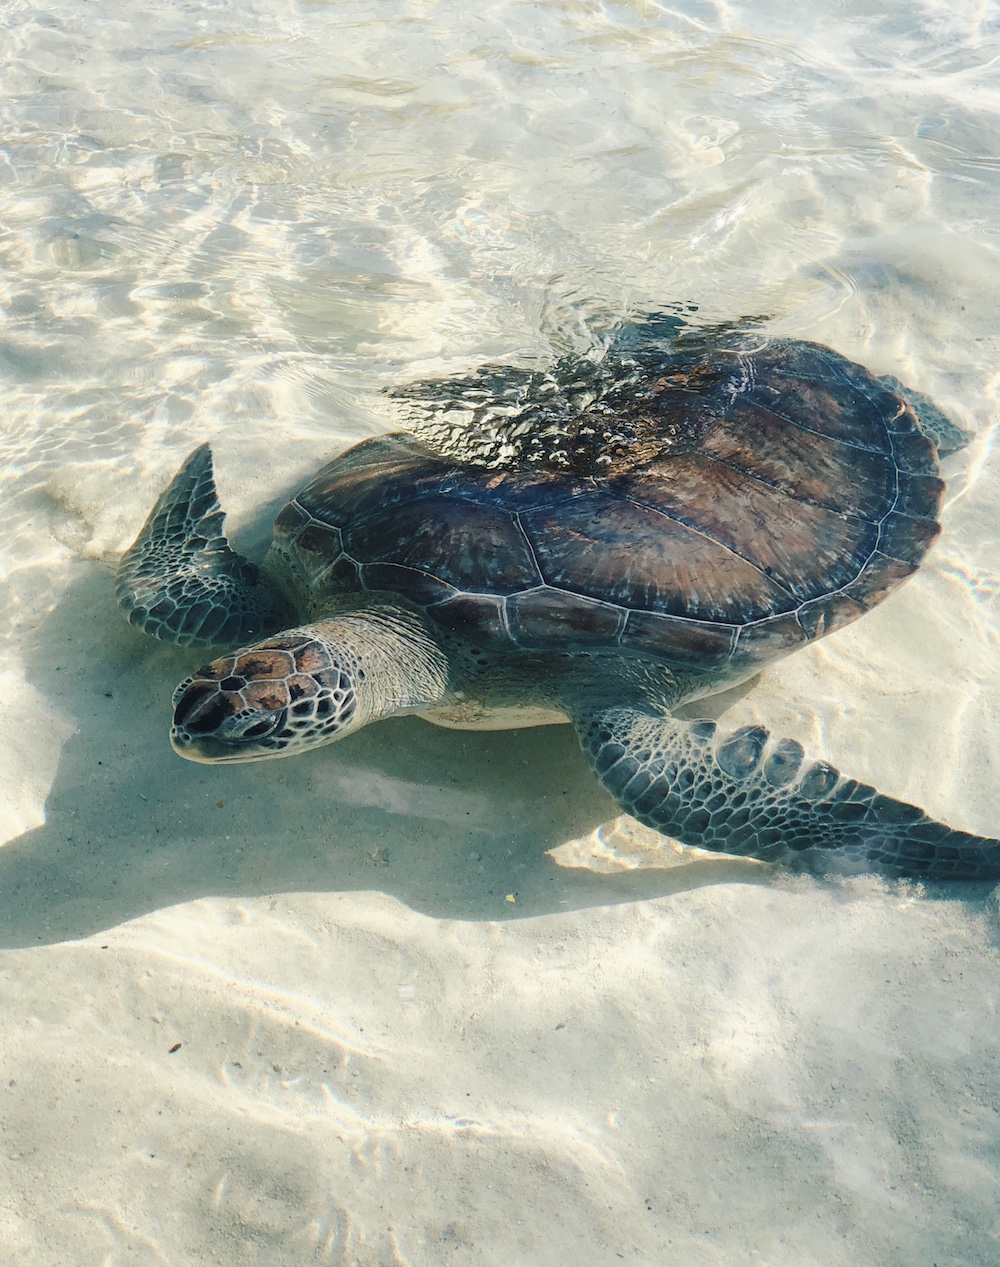 Sea turtle swimming at animal sanctuary Grand Hyatt Baha Mar Bahamas